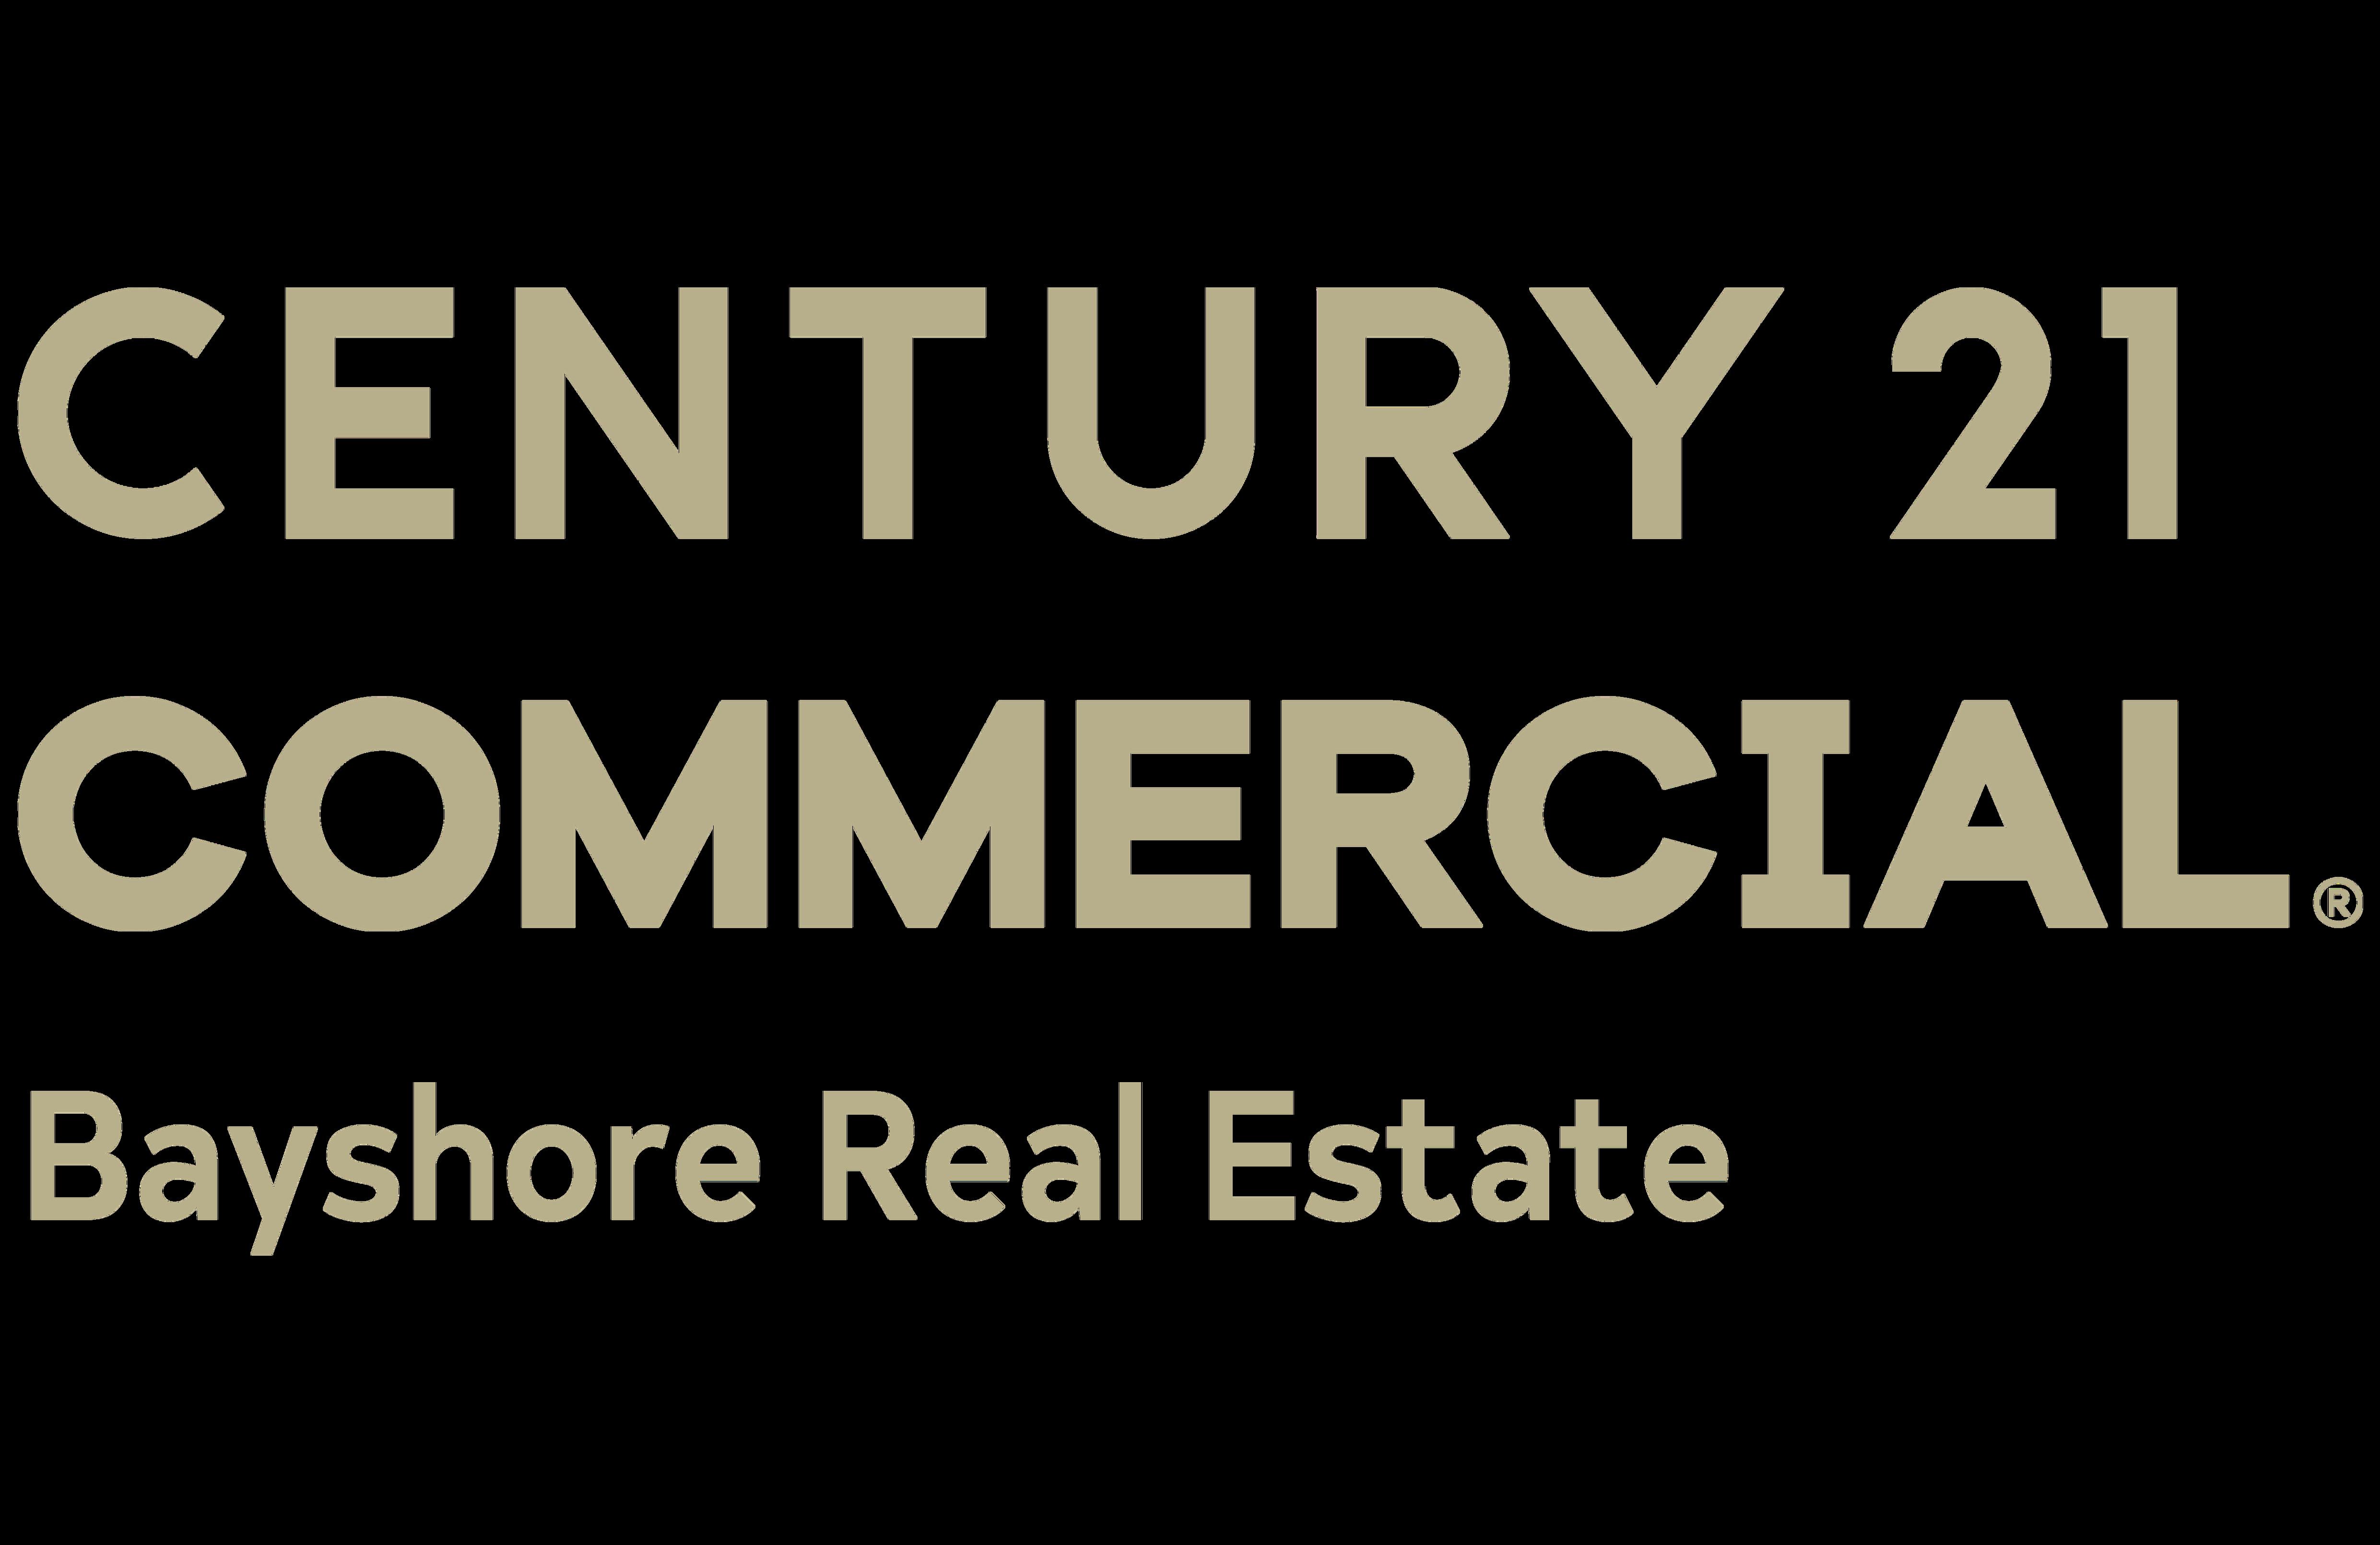 CENTURY 21 Bayshore Real Estate